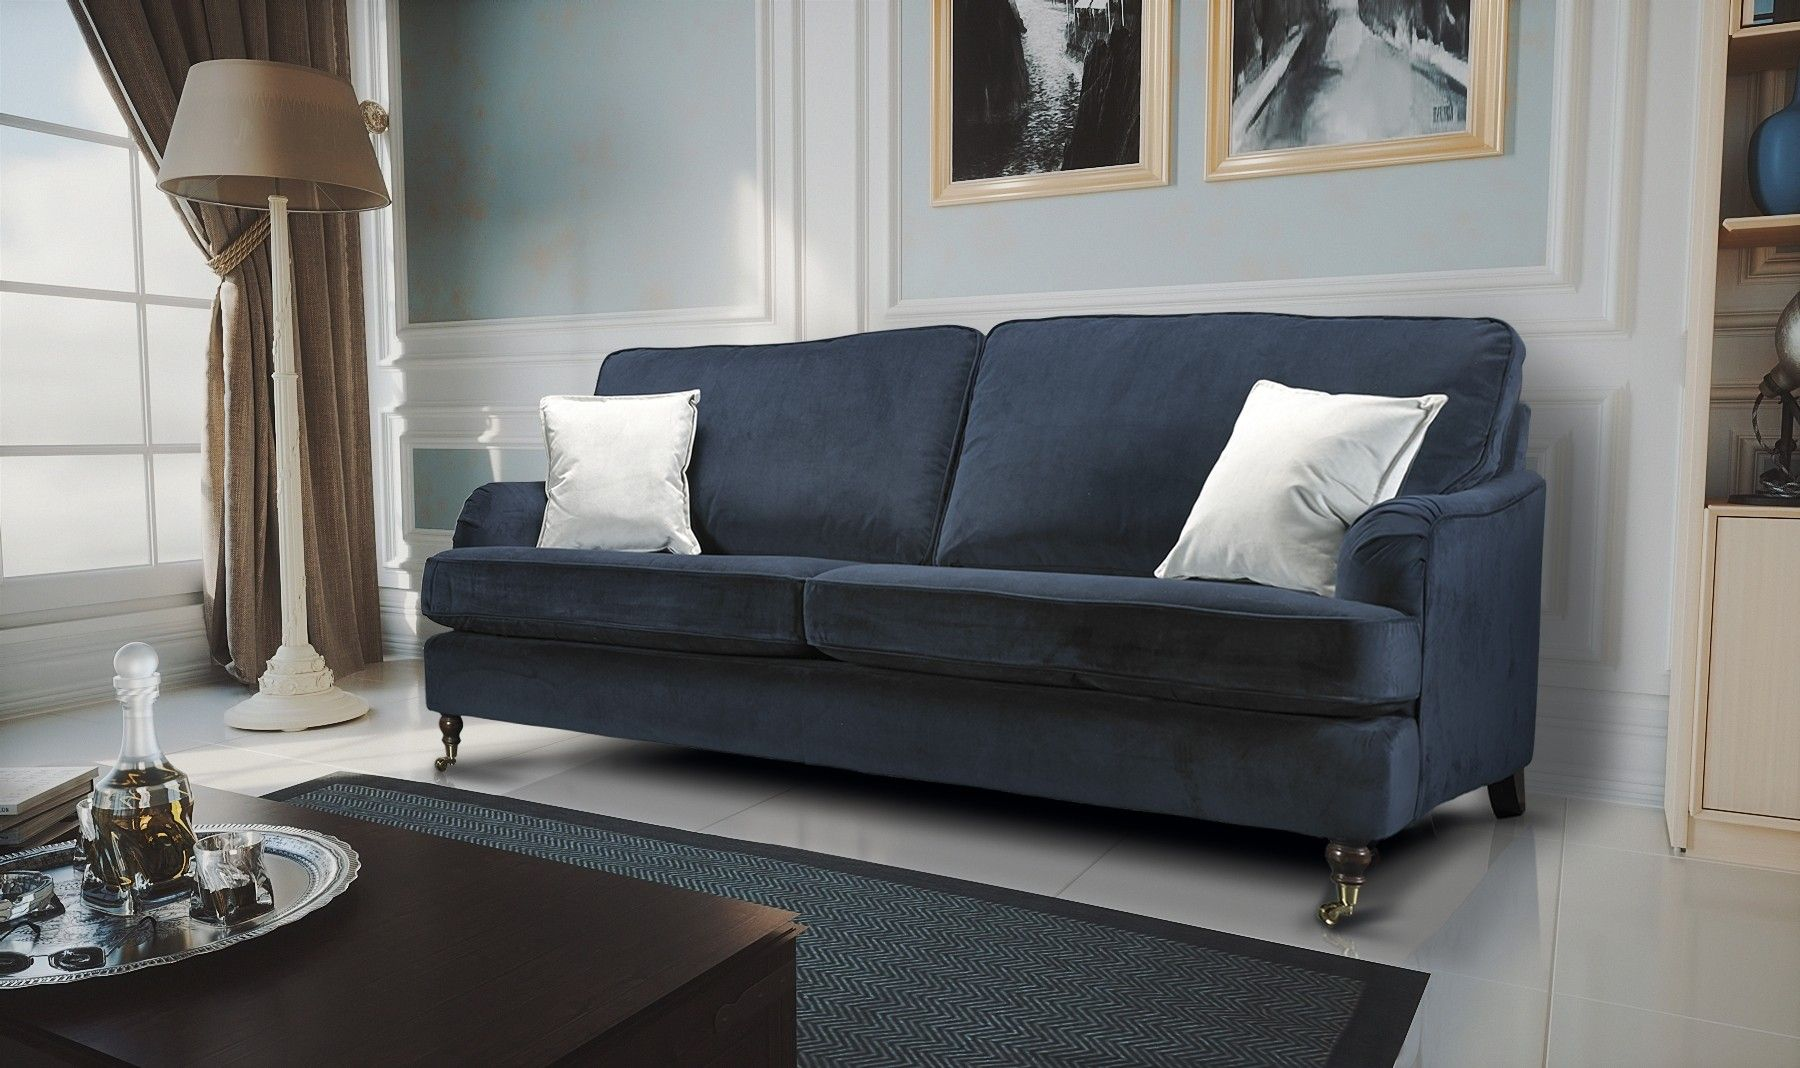 Astbury Bella 3 Seater Velvet Sofa Dark Blue Navy Sofas Sofa Single Seat Sofa Living Room Sofa